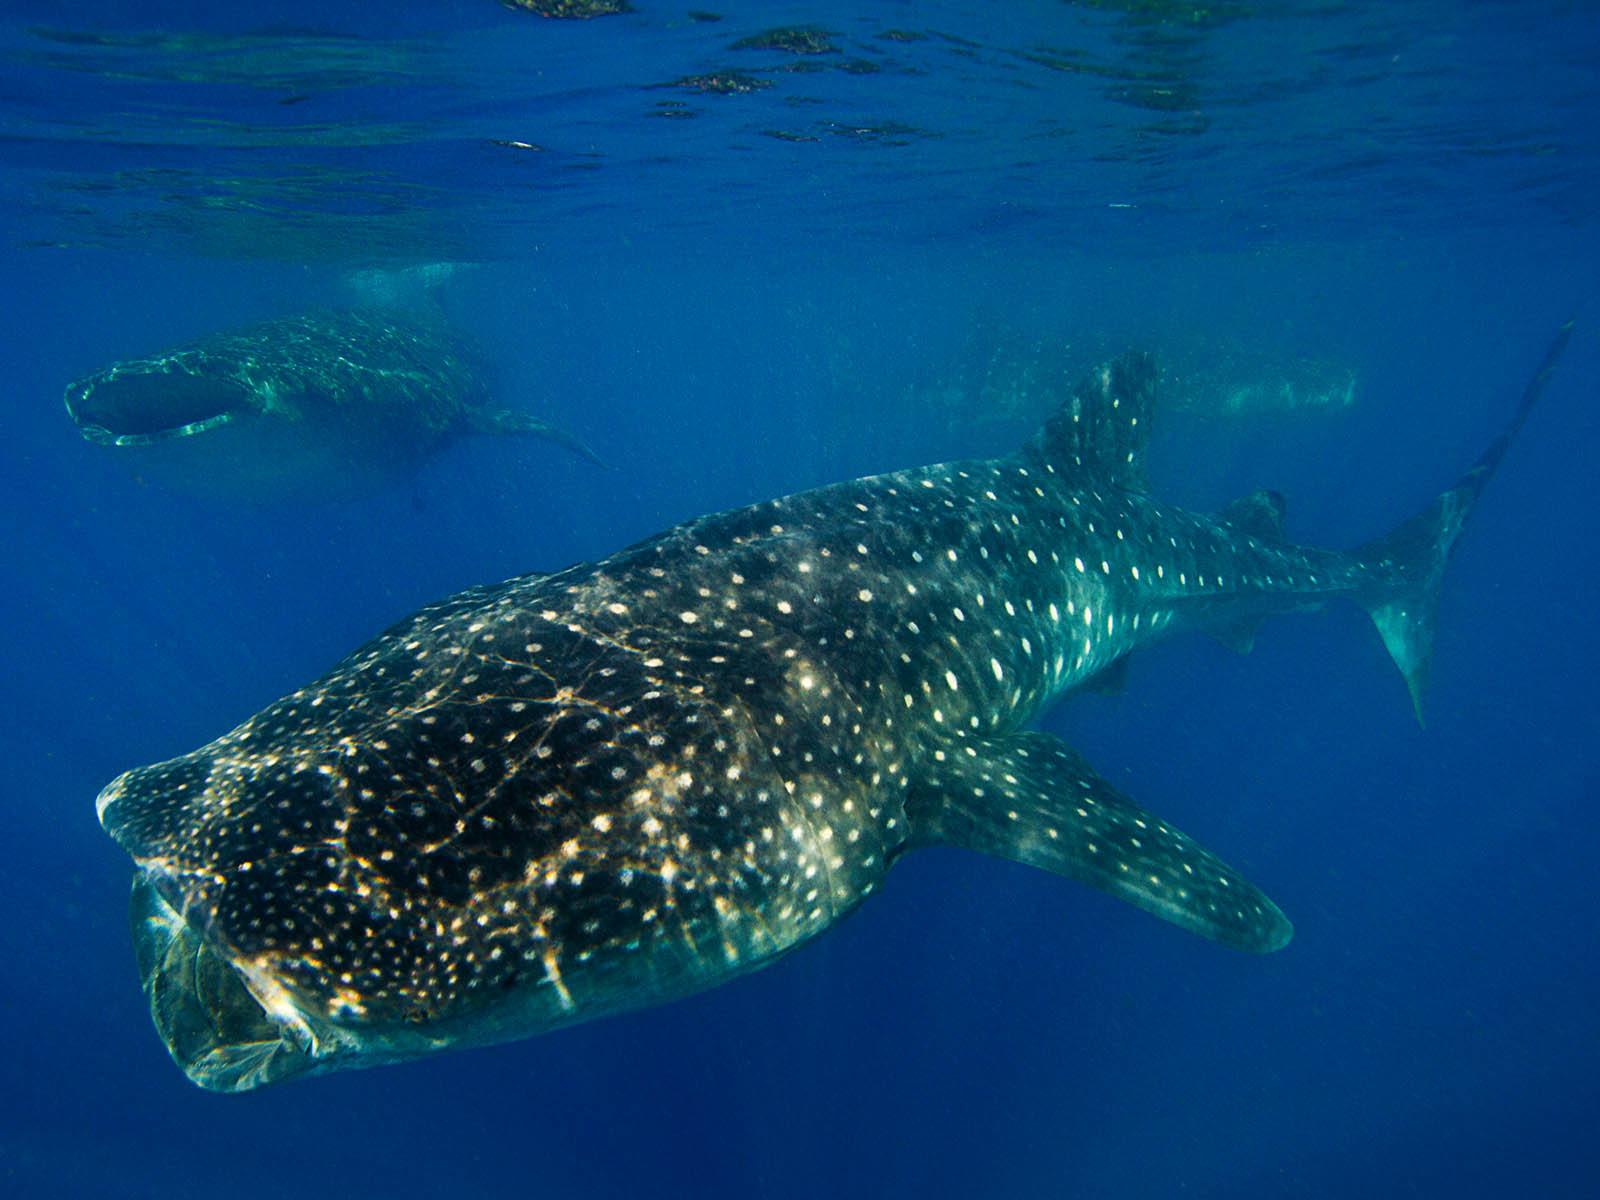 798-7754-4175-set-mb-oris-aquis-gmt-date-whale-shark-limited-edition-2.jpg